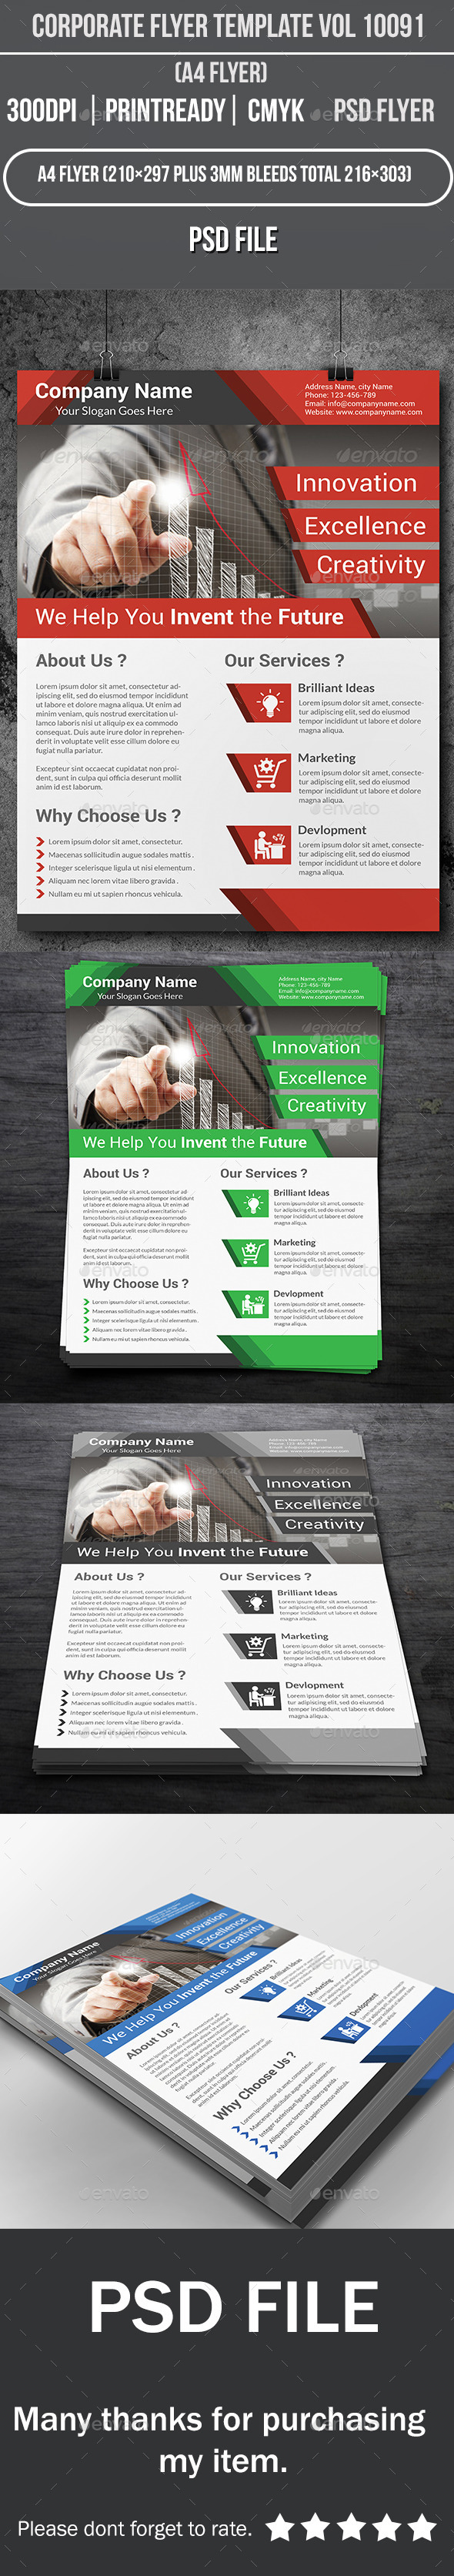 GraphicRiver Corporate Flyer Template Vol 10091 9995940